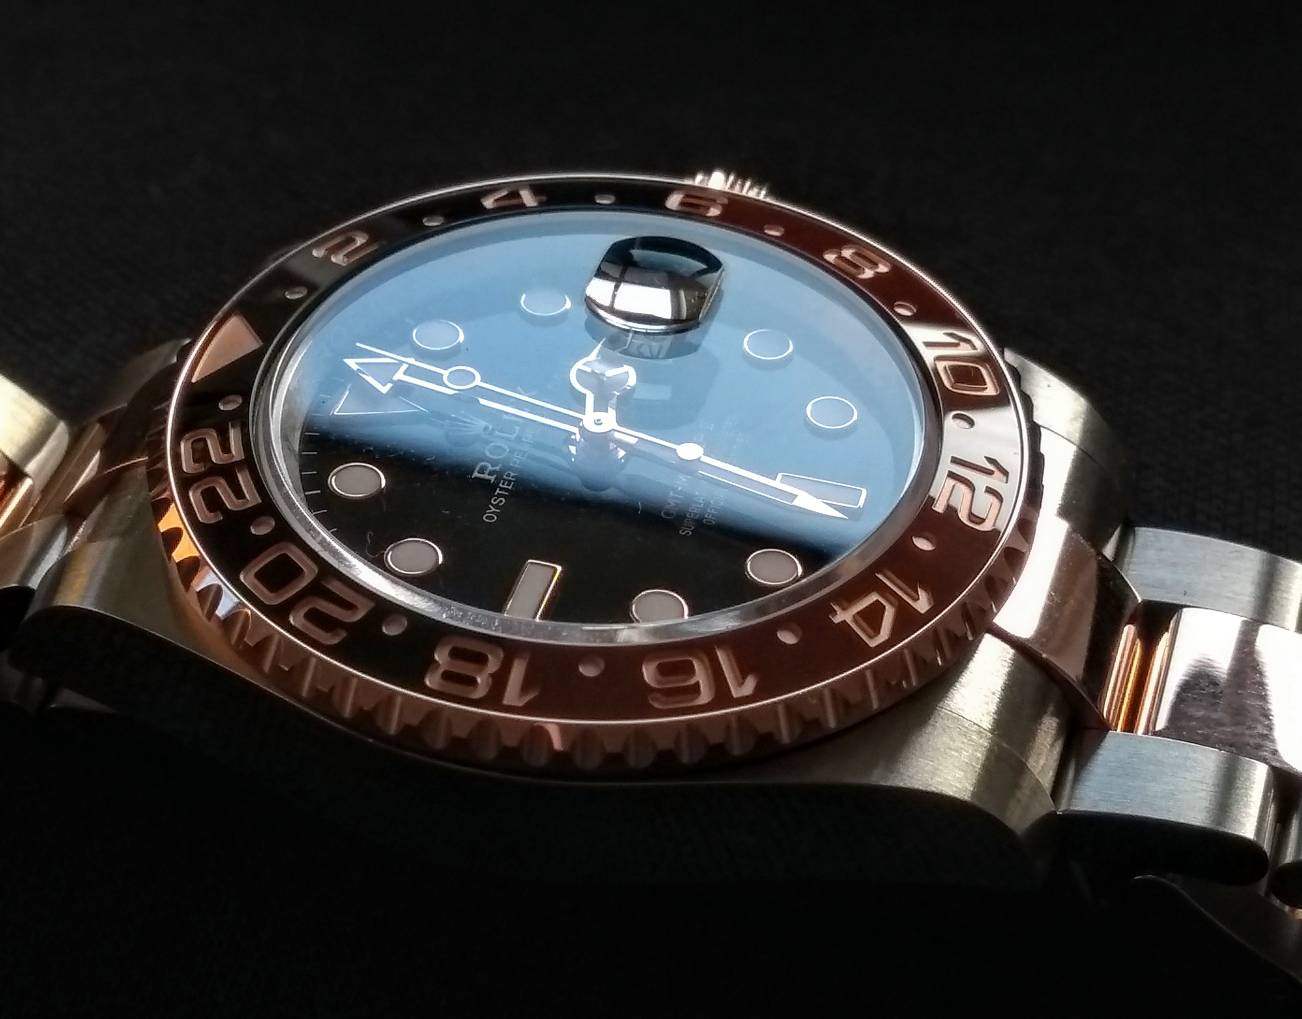 Bluesy & Rootbeer - Rolex Forums - Rolex Watch Forum